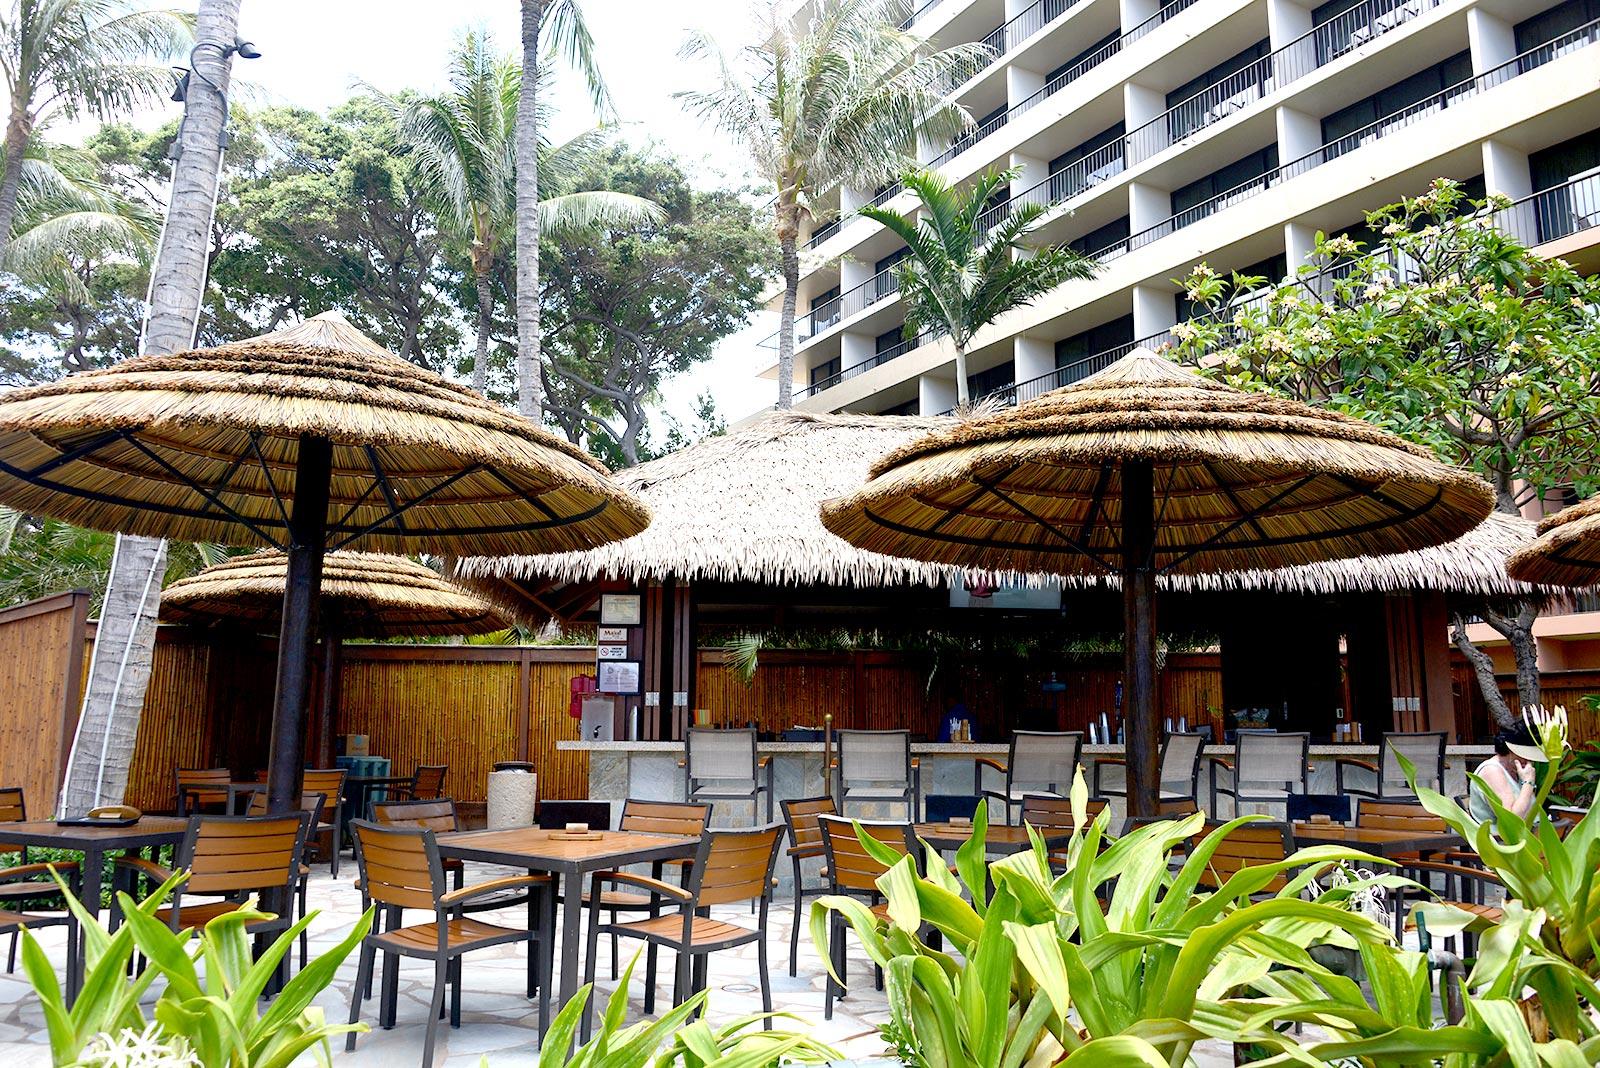 marriott-maui-ocean-club-lahaina-napili-42